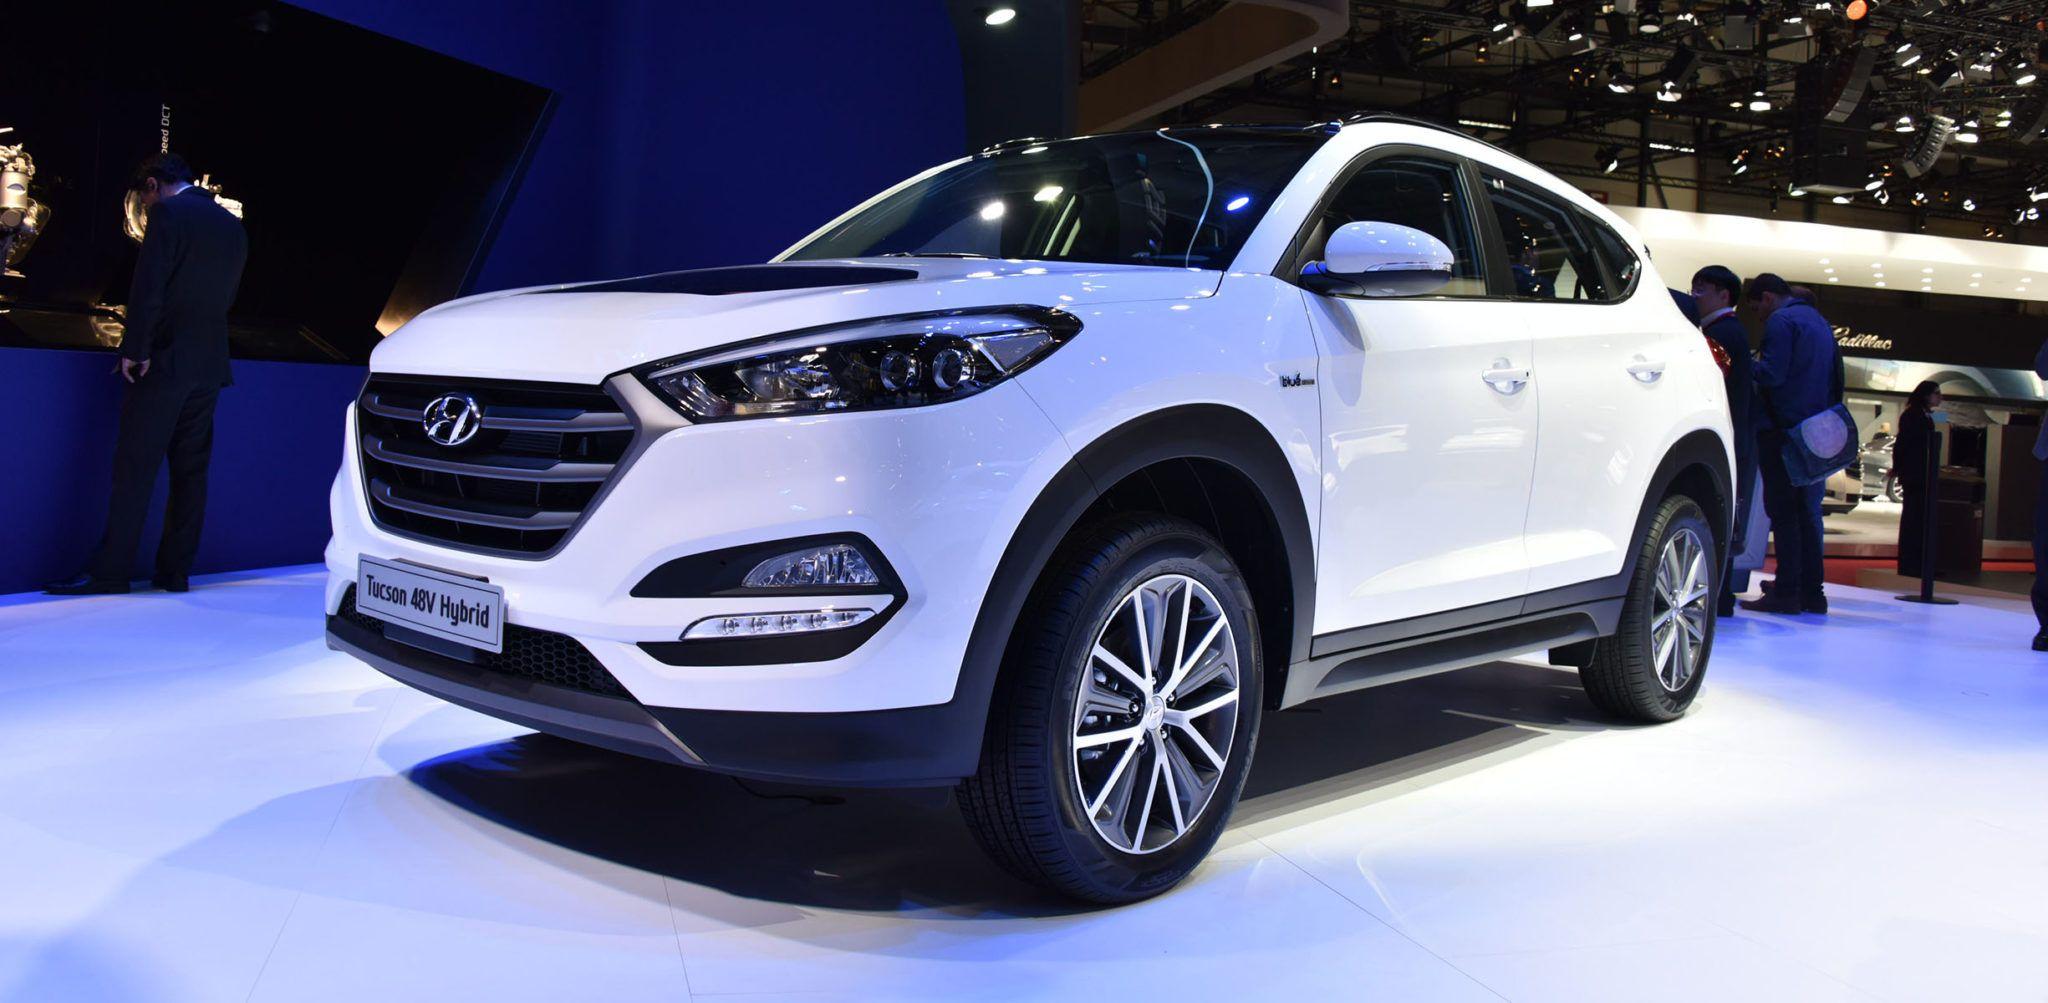 2018 hyundai tucson changes hybrid model hyundai tucson